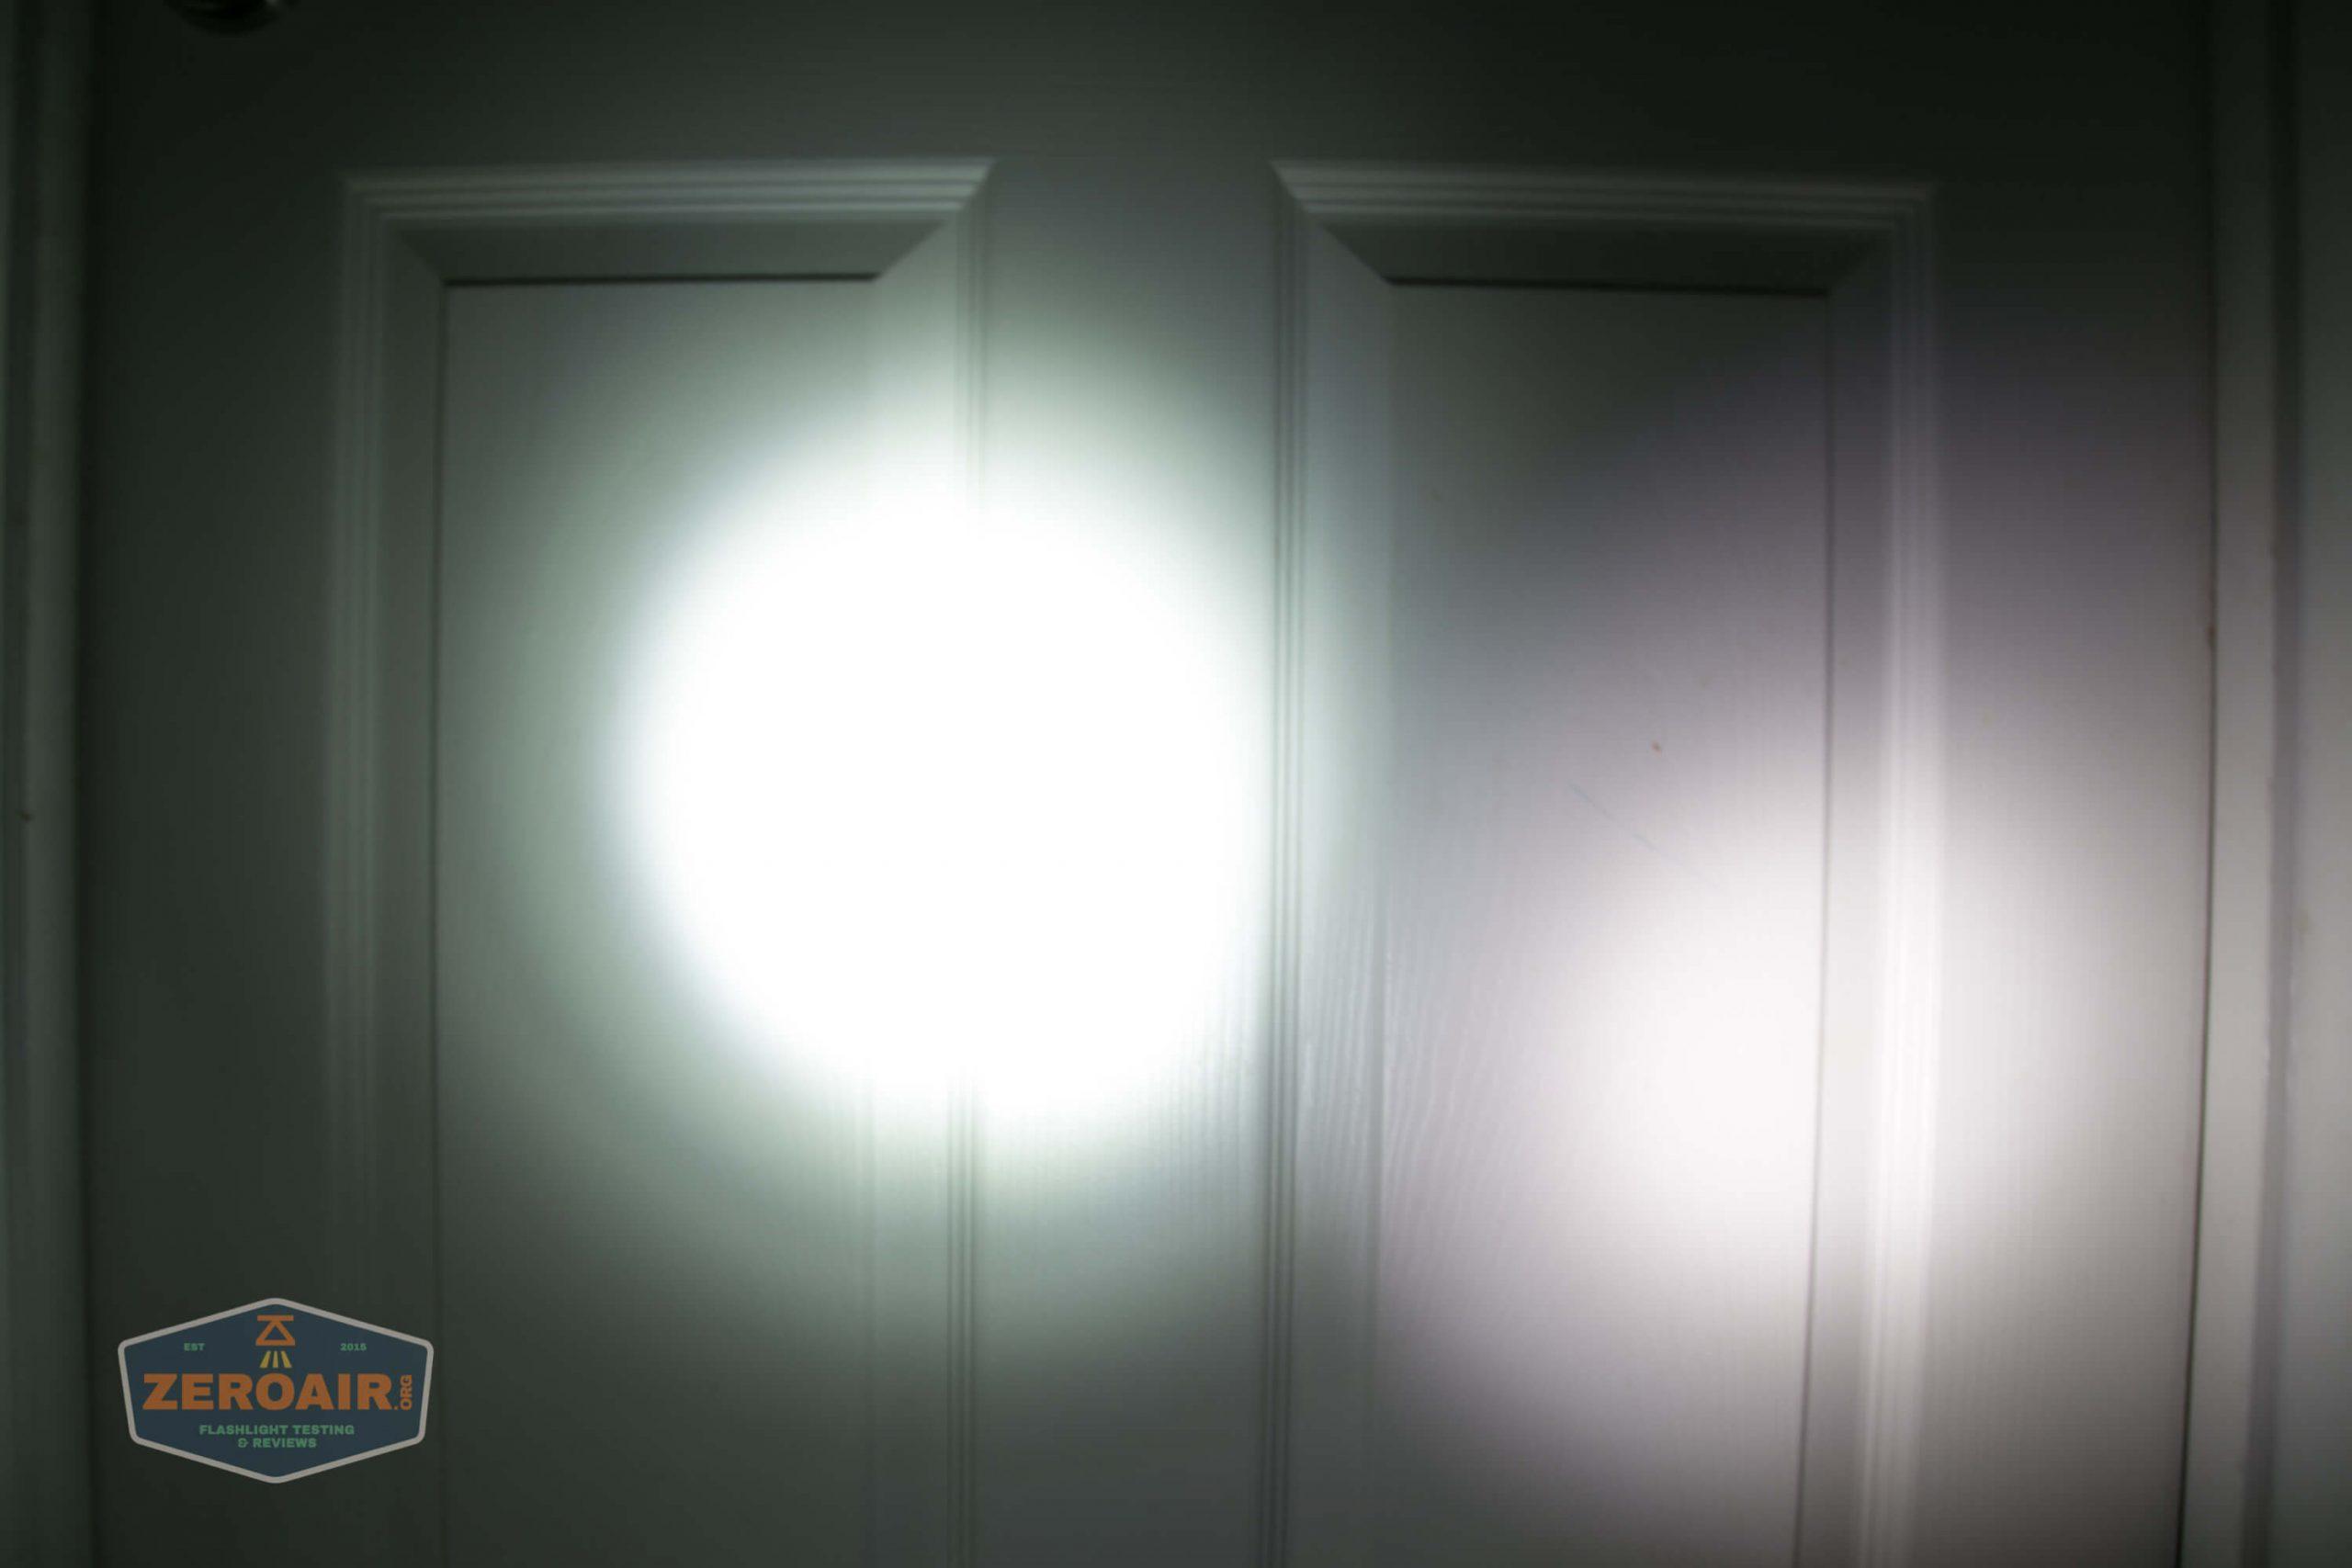 fireflylite e01 luminus sst-40 21700 beamshot door vs blf-348 4